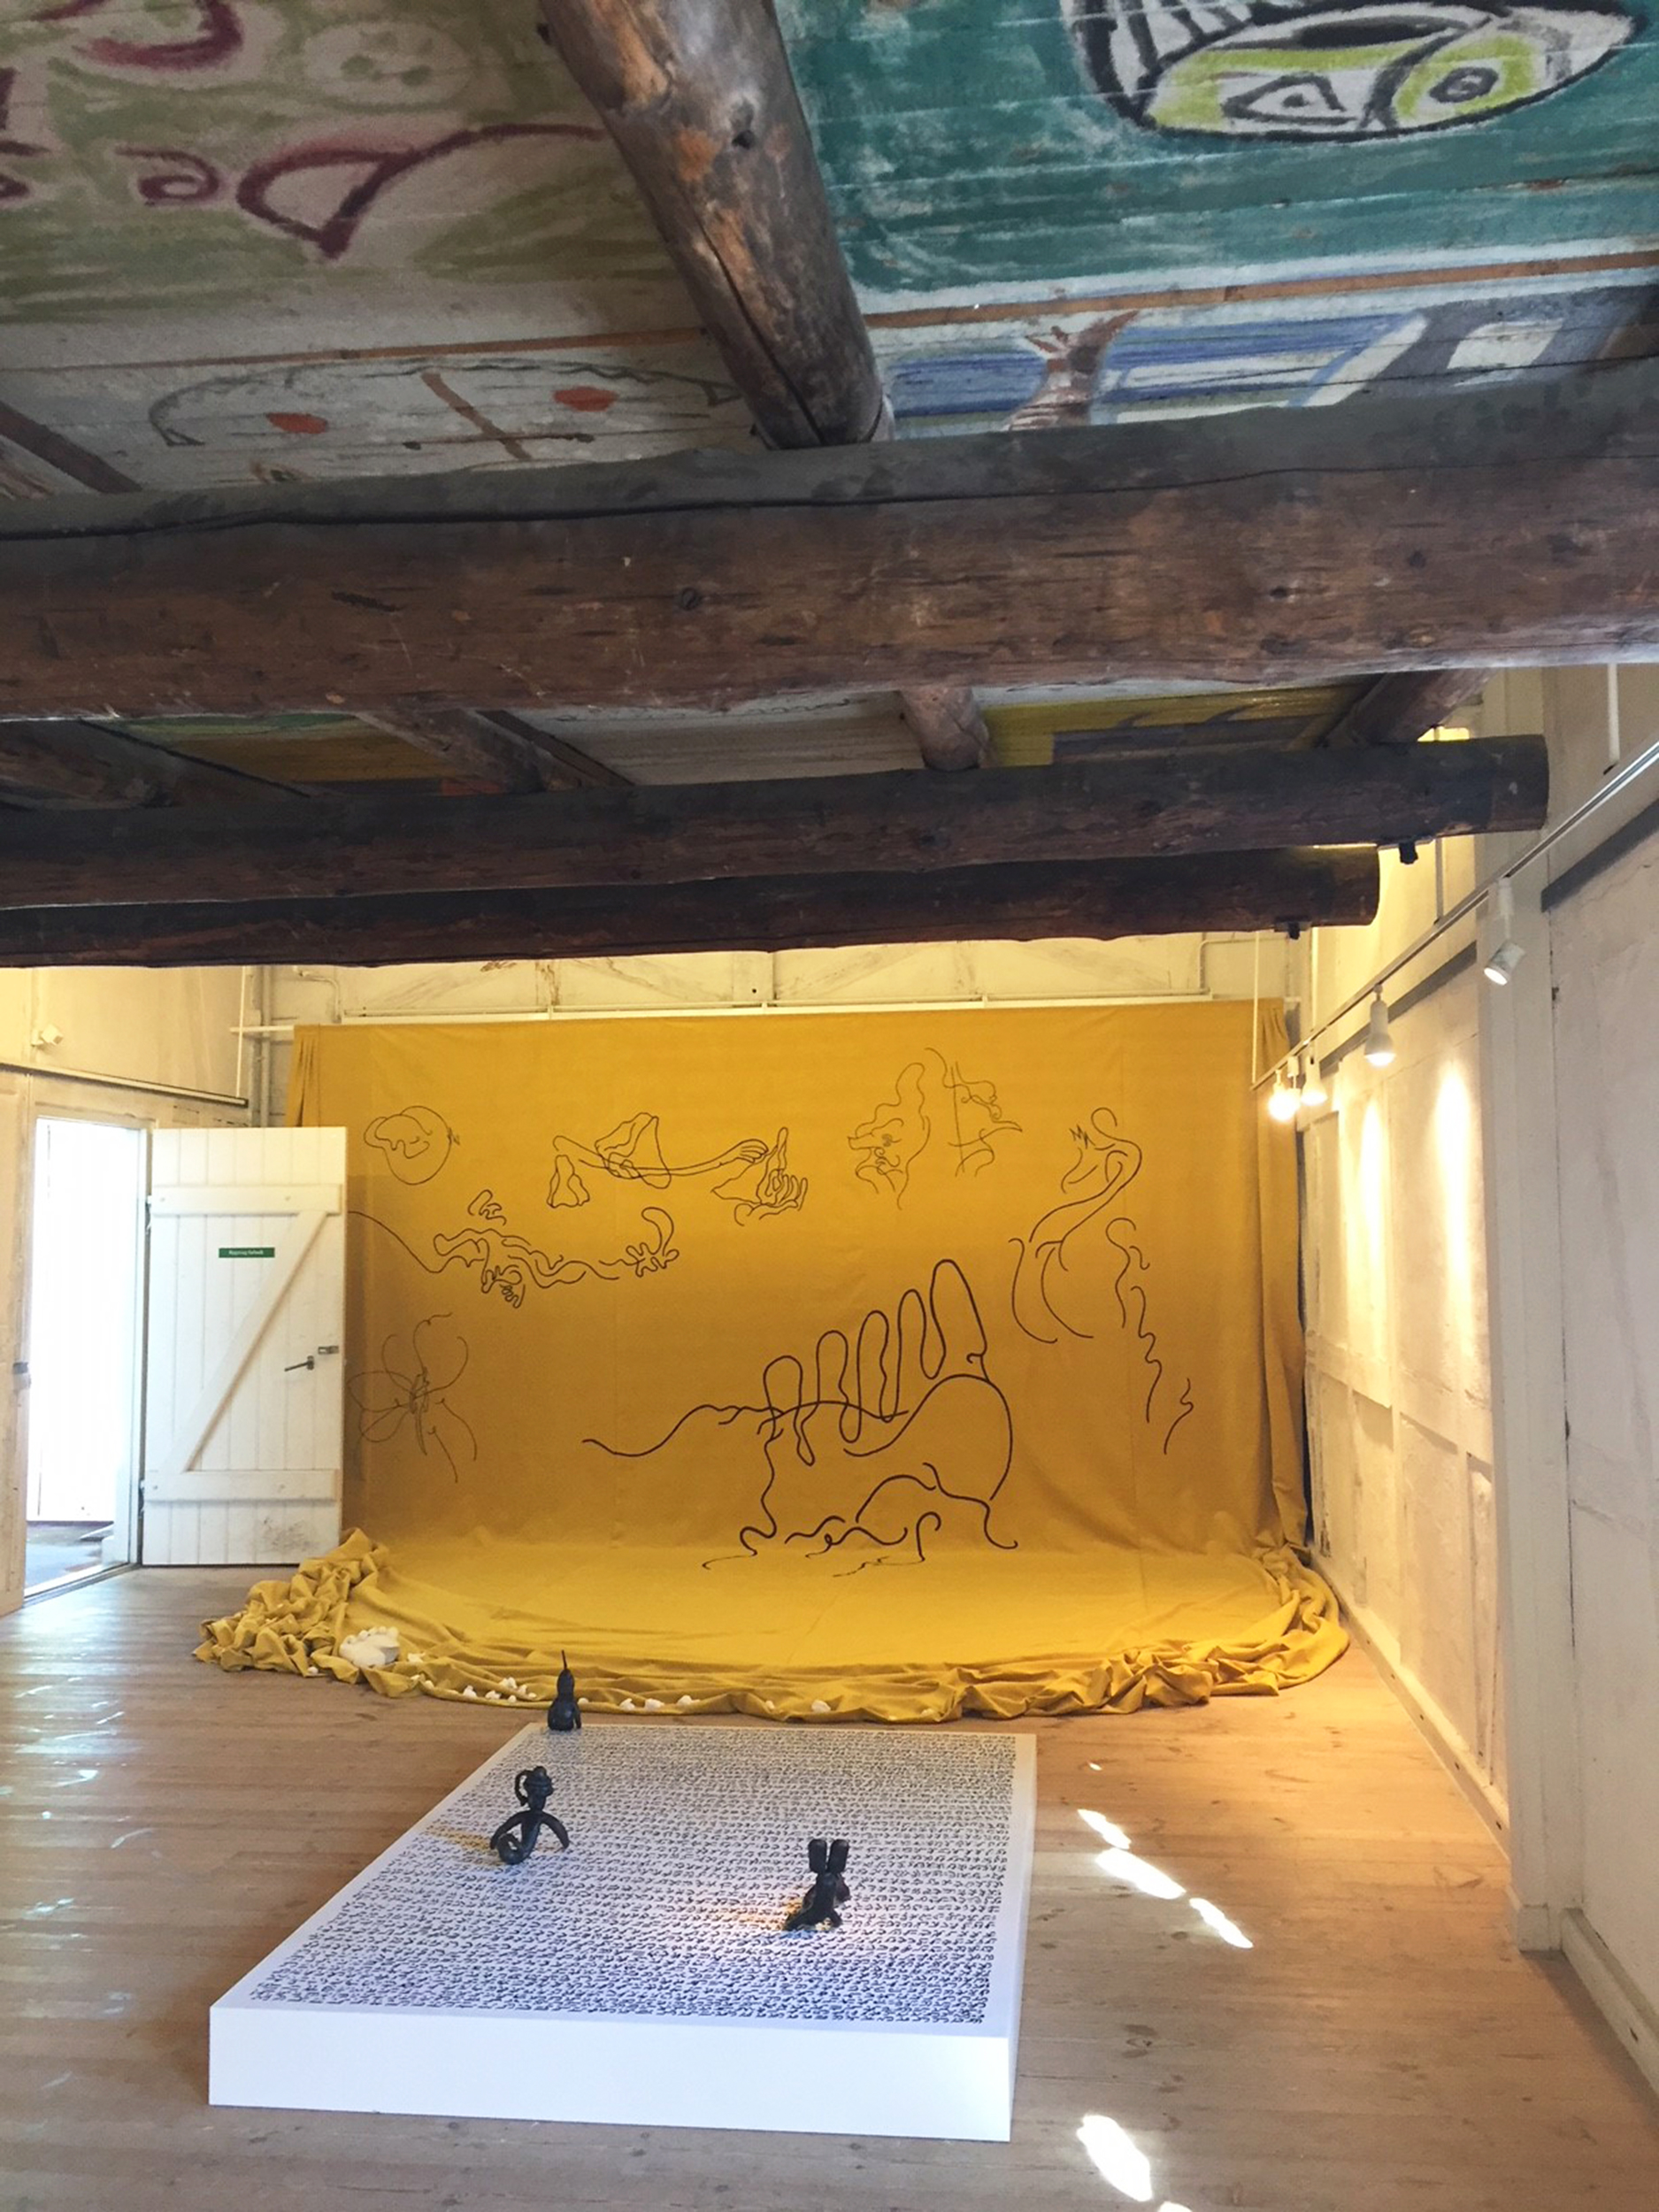 Udstillingen Epifyt i Cobra-rummet (installation view)